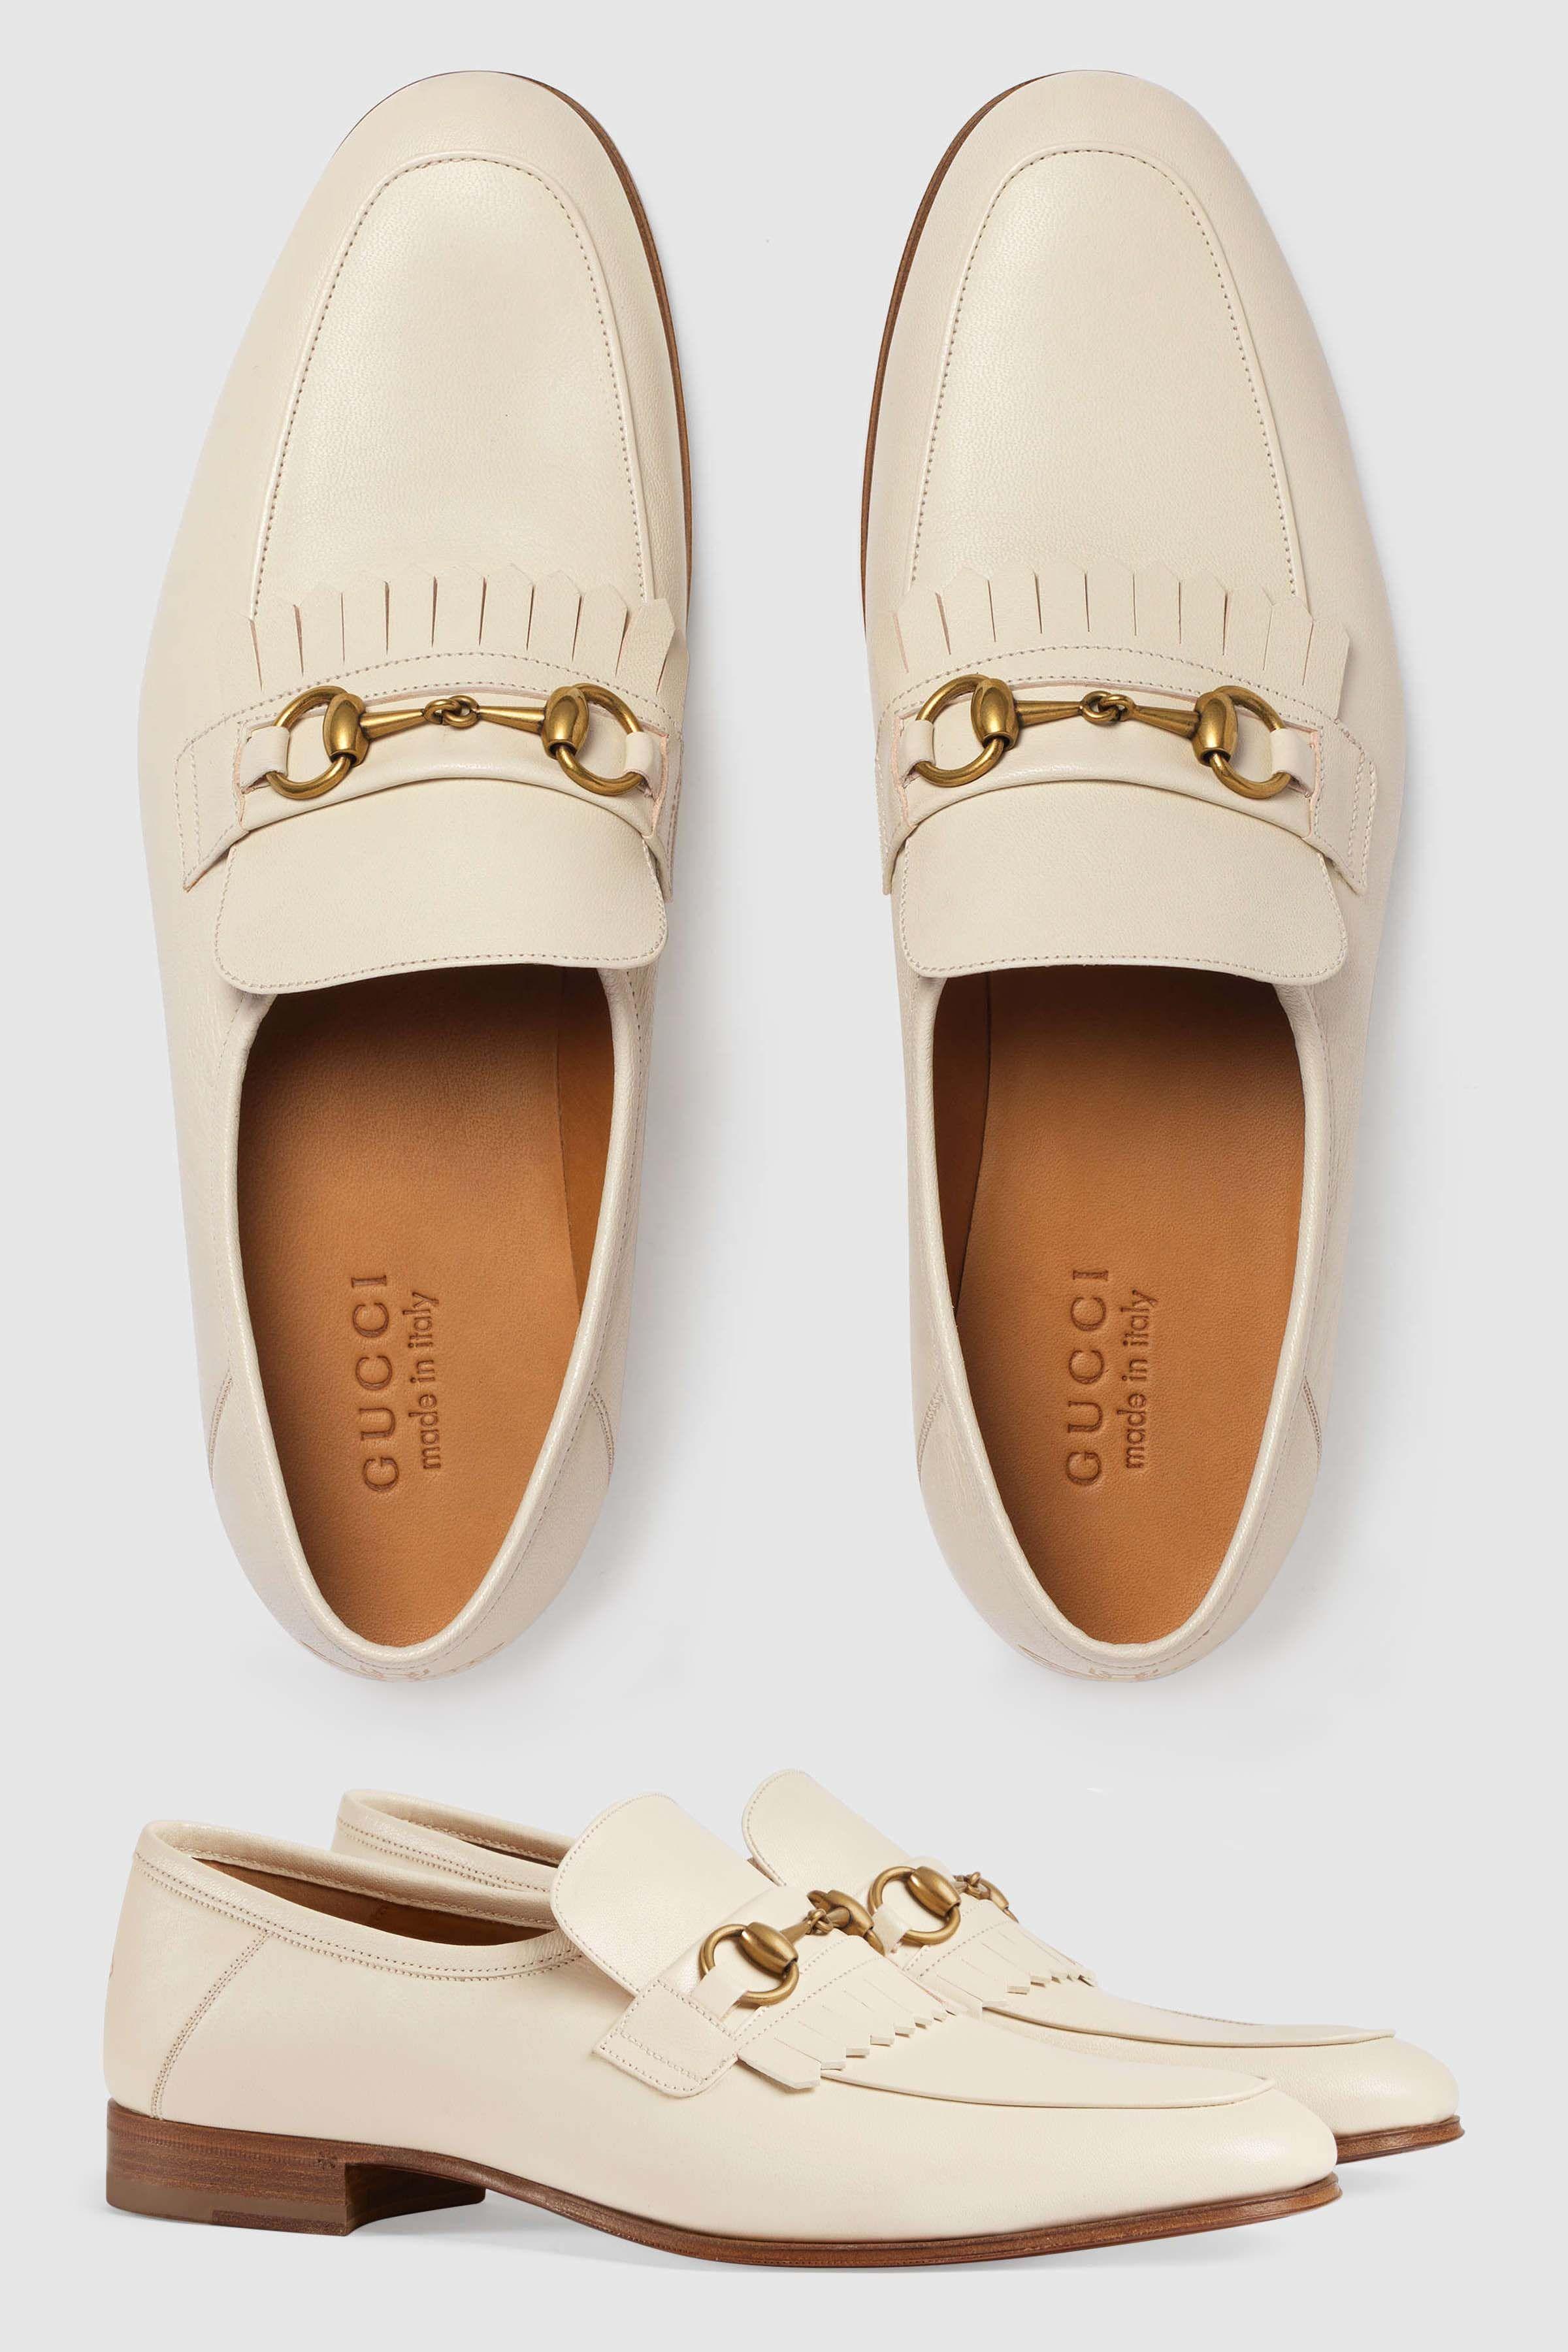 0ac3ae9ac1e GUCCI Leather fringe Horsebit loafer